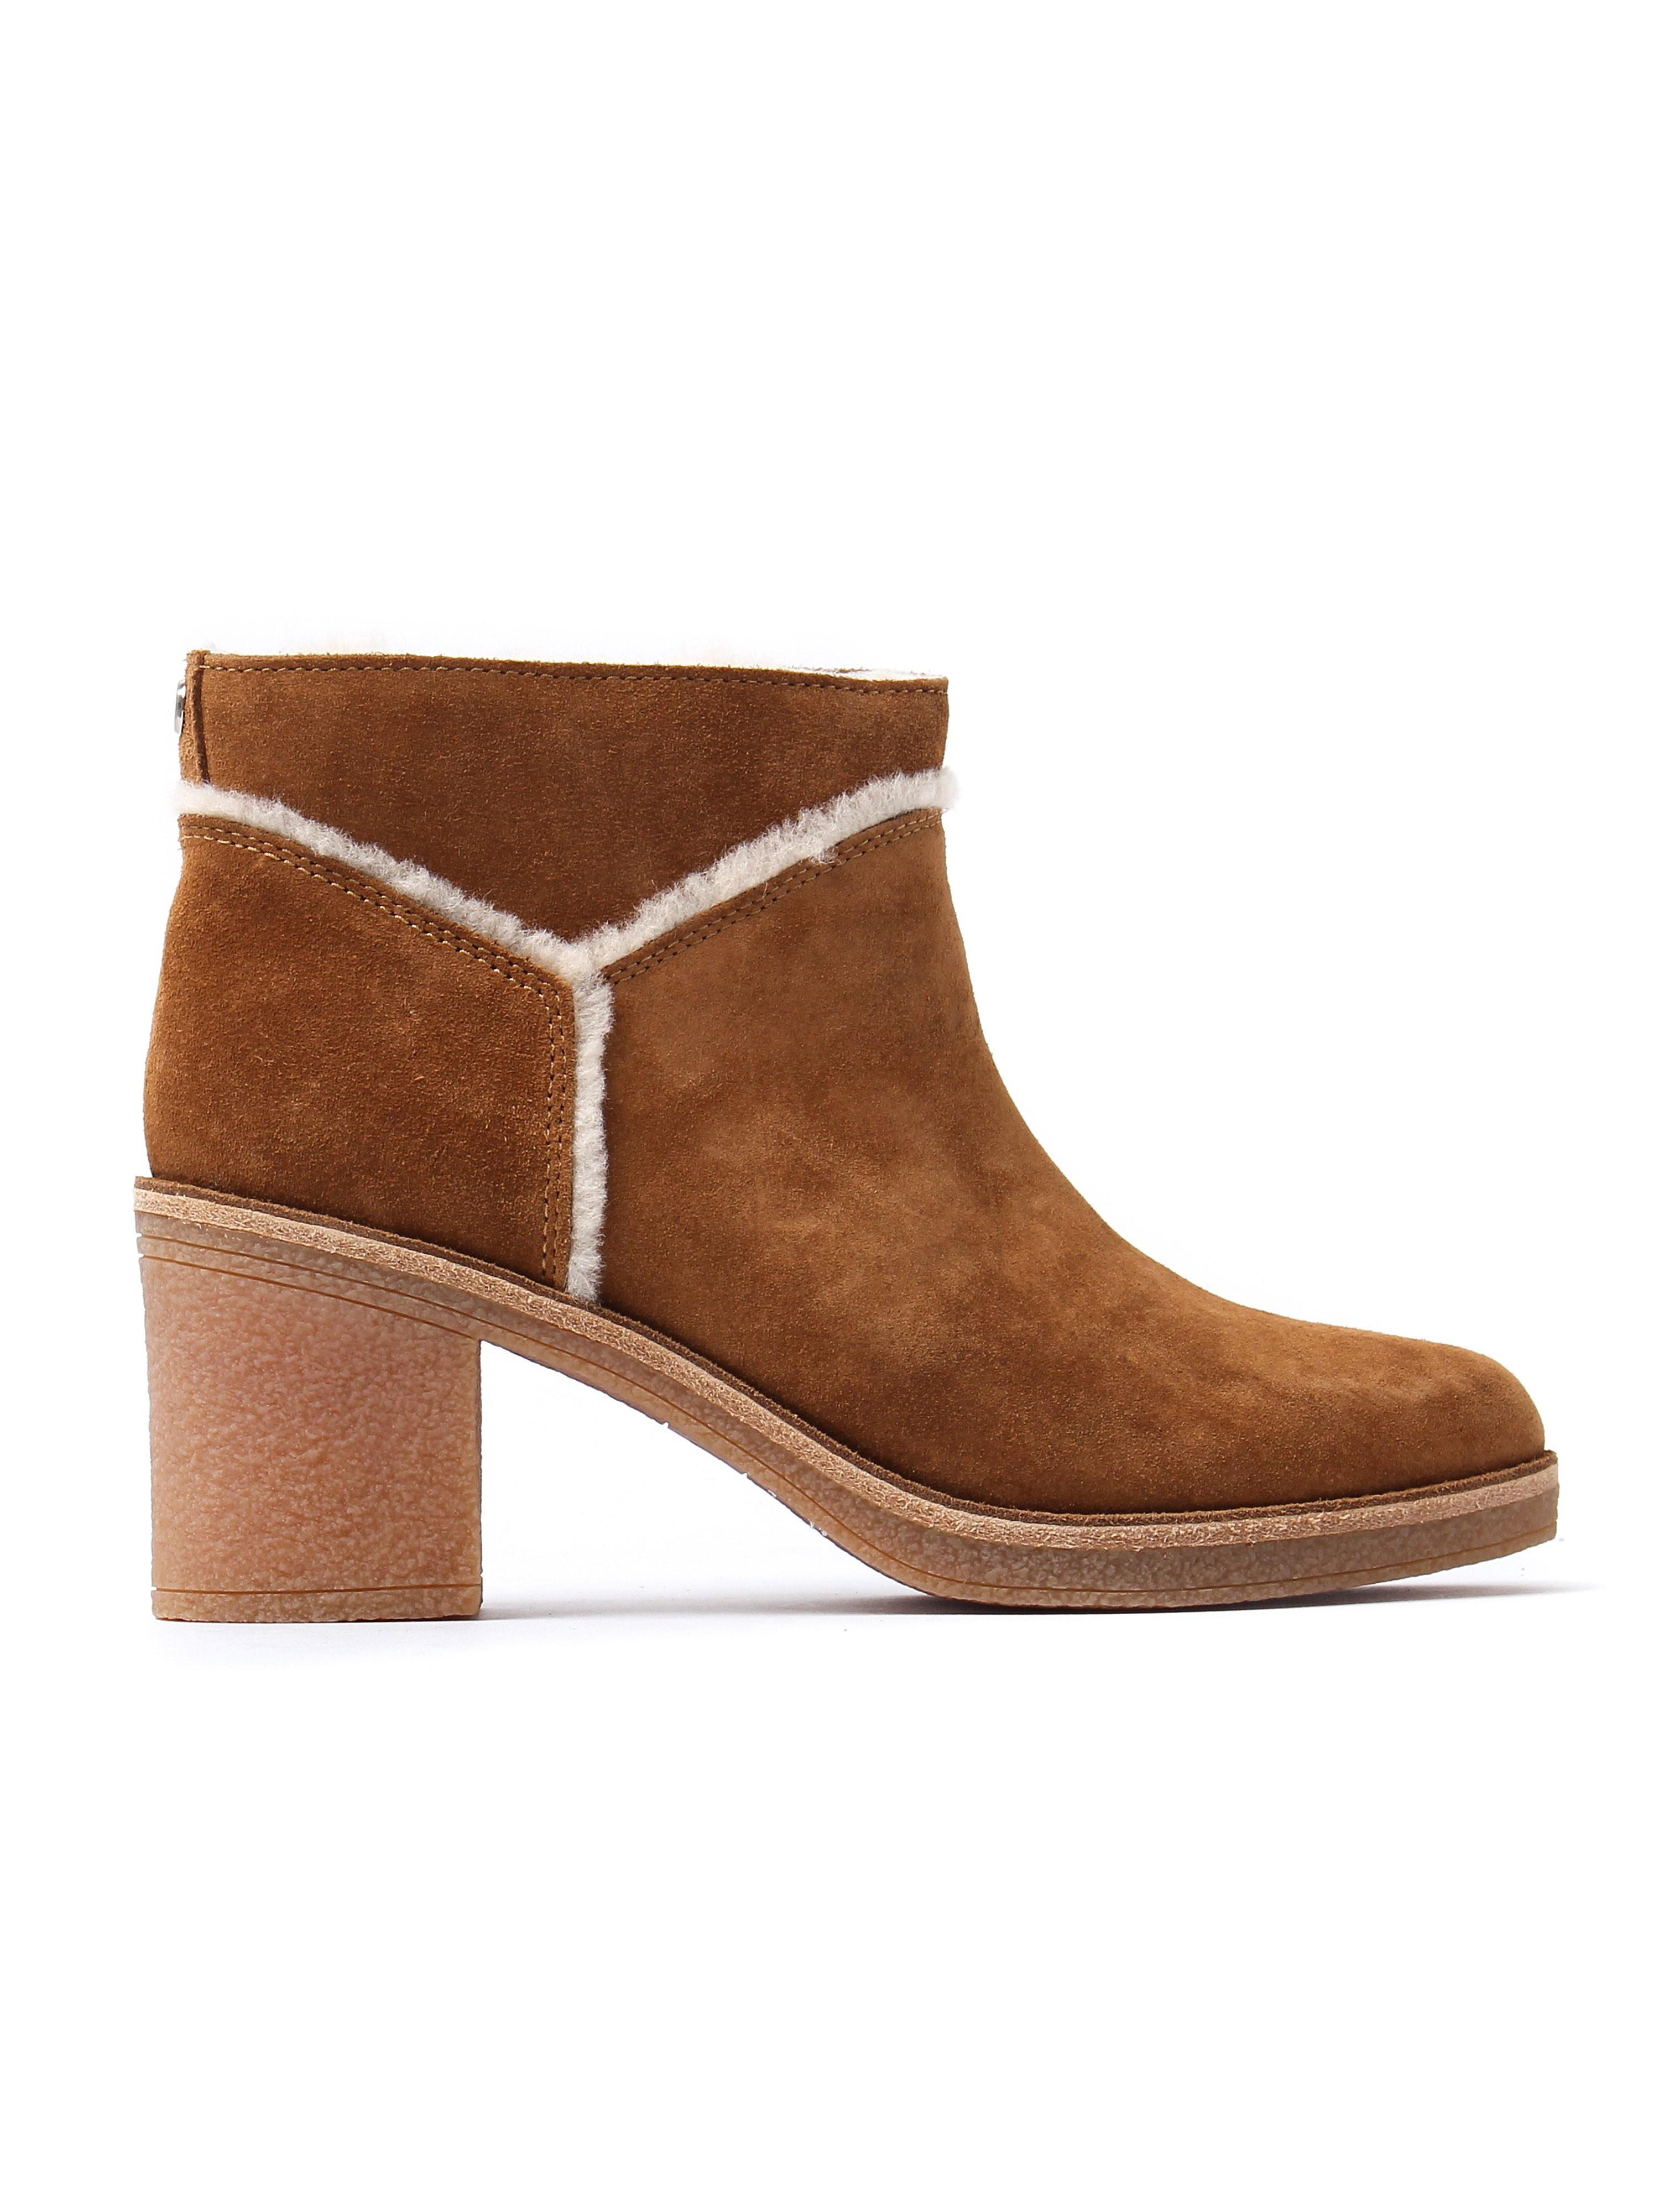 UGG Women's Kasen Ankle Boots - Chestnut